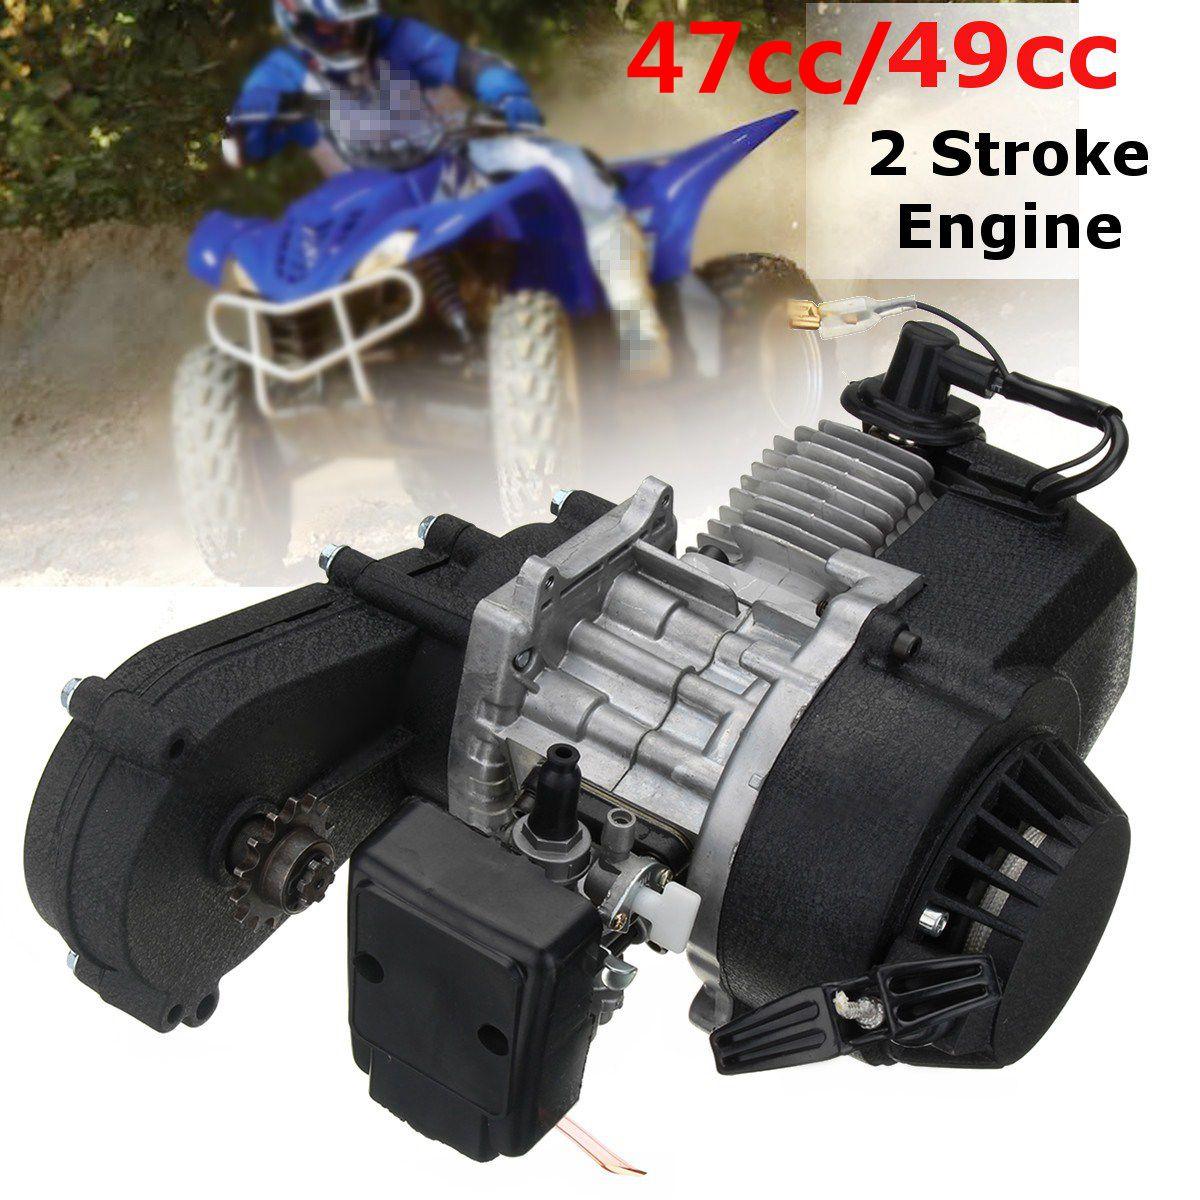 49cc /47cc Engine 2-Stroke Electric Pull Start W/Transmission For Mini Moto Quad Bike